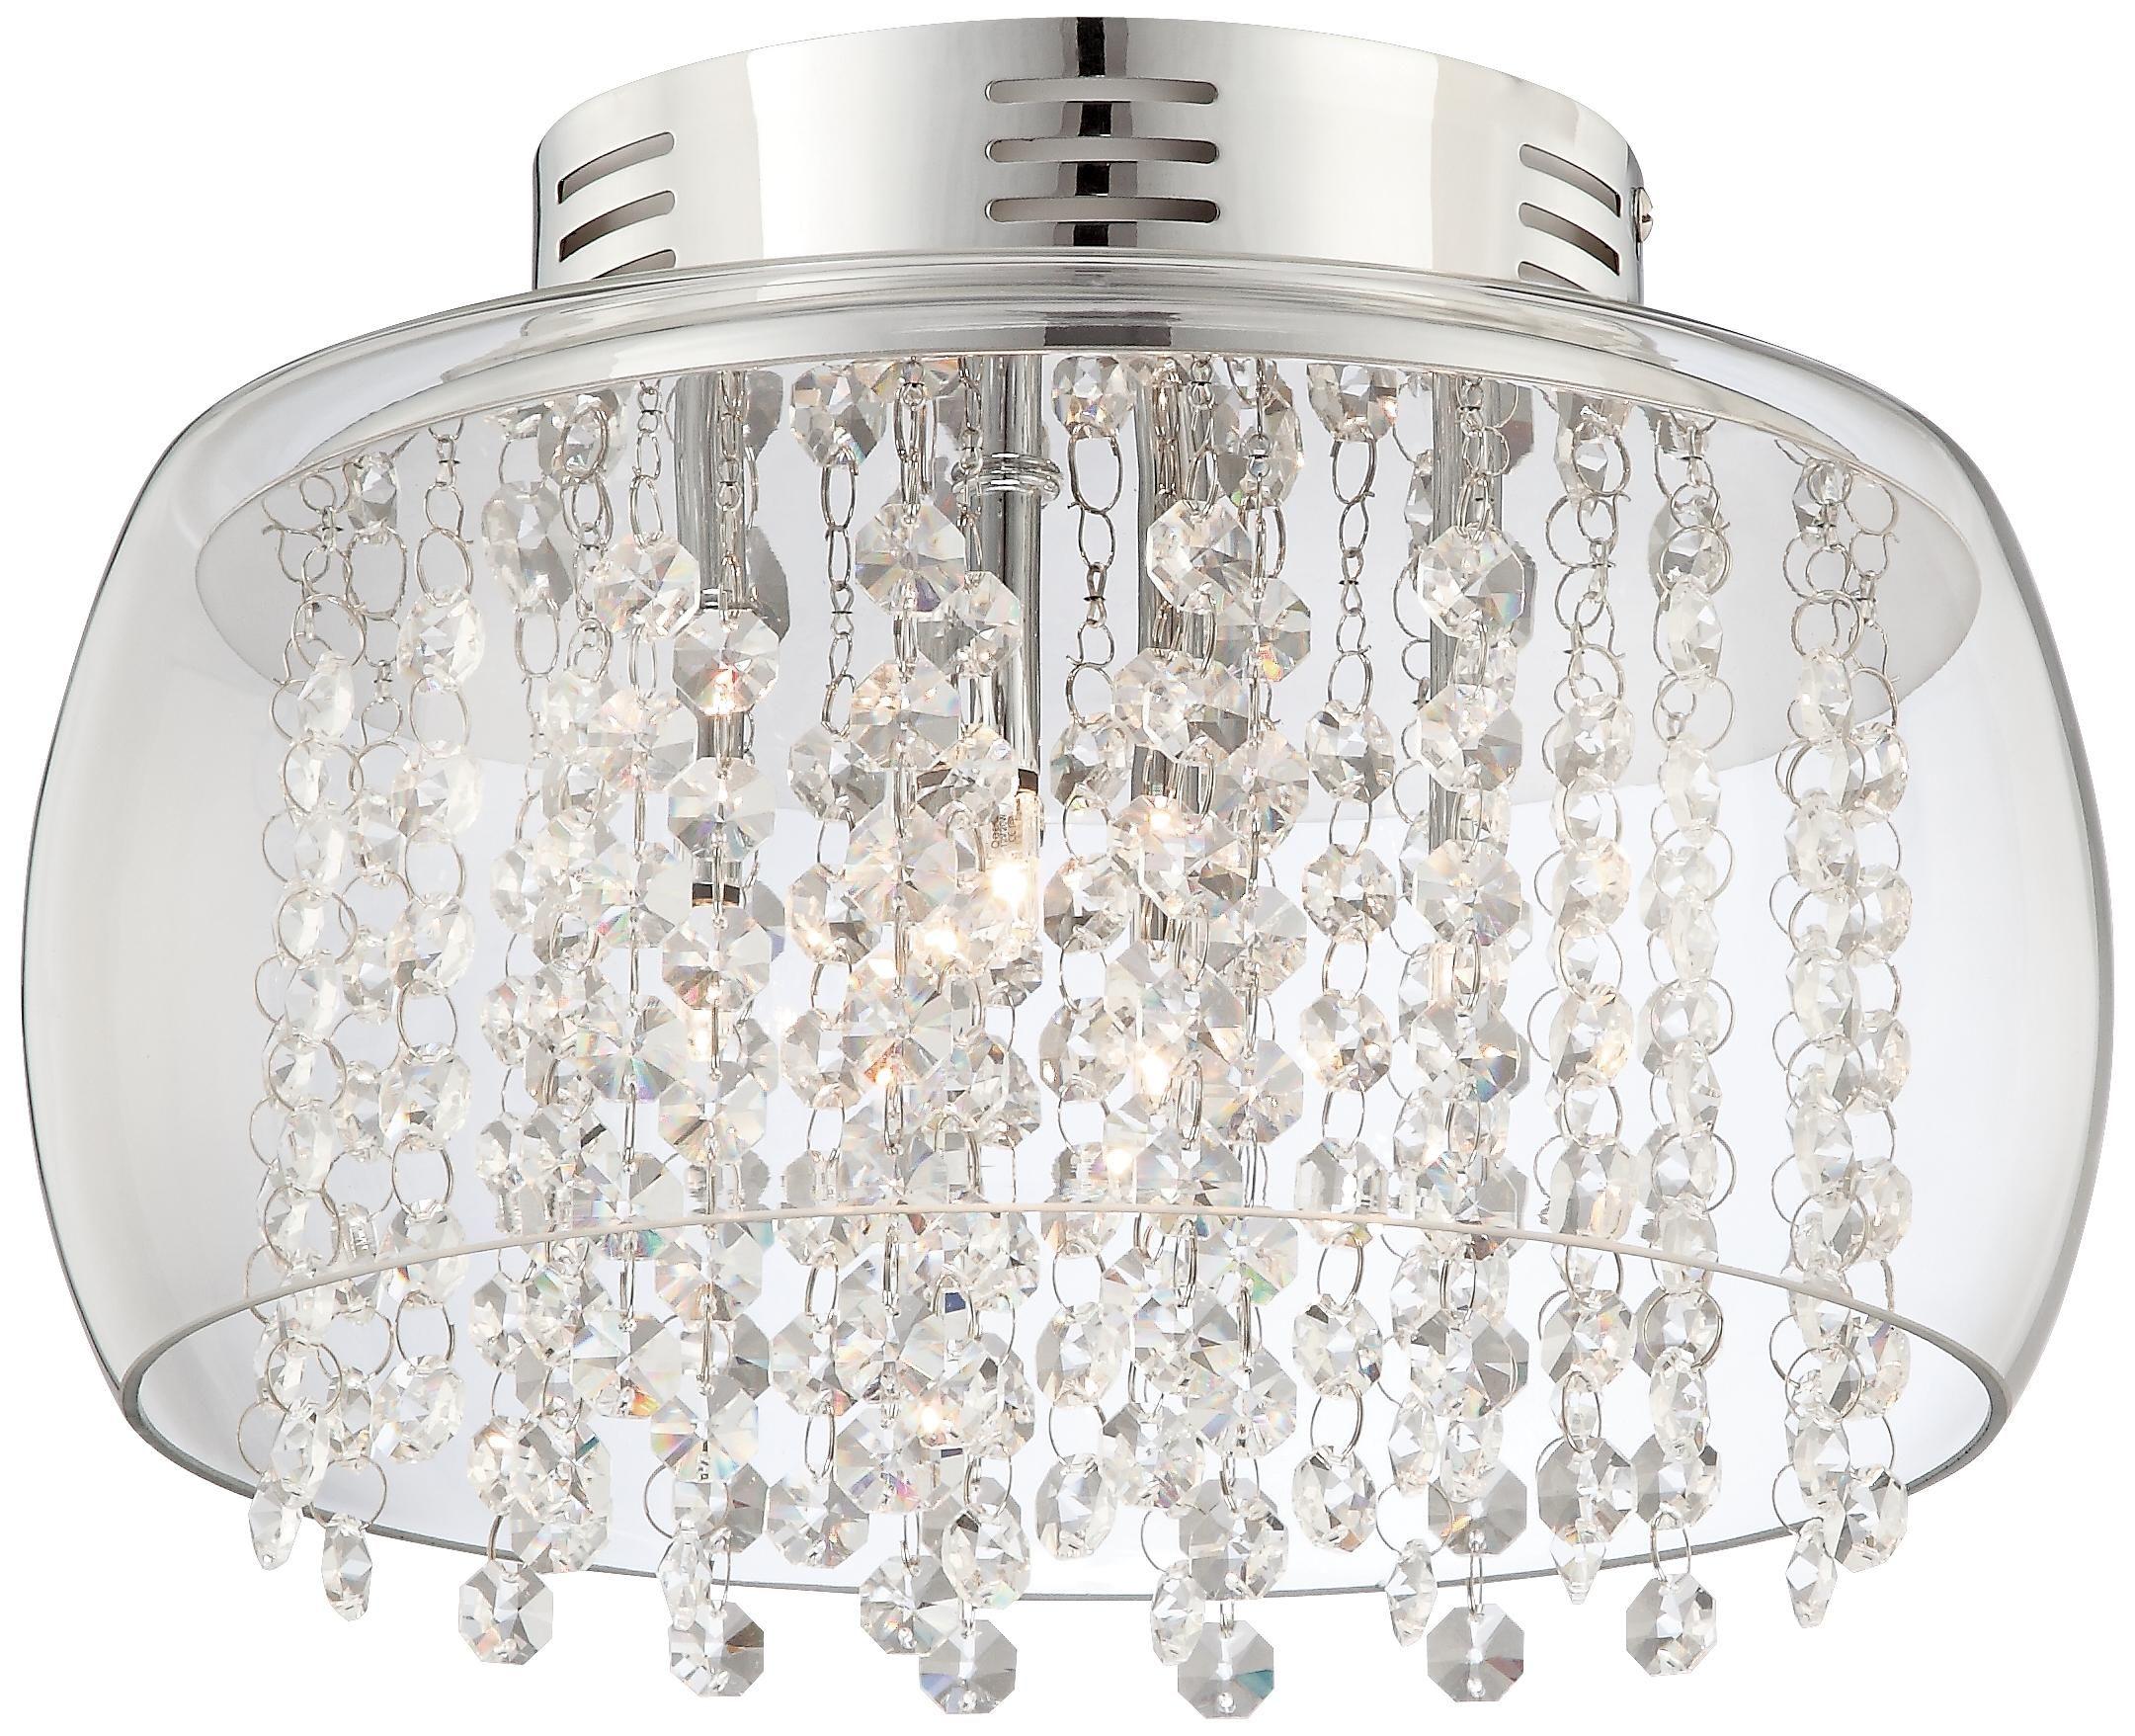 Possini euro crystal rainfall 11w glass drum ceiling light possini crystal rainfall glass drum 11 wide ceiling light lampsplus arubaitofo Choice Image